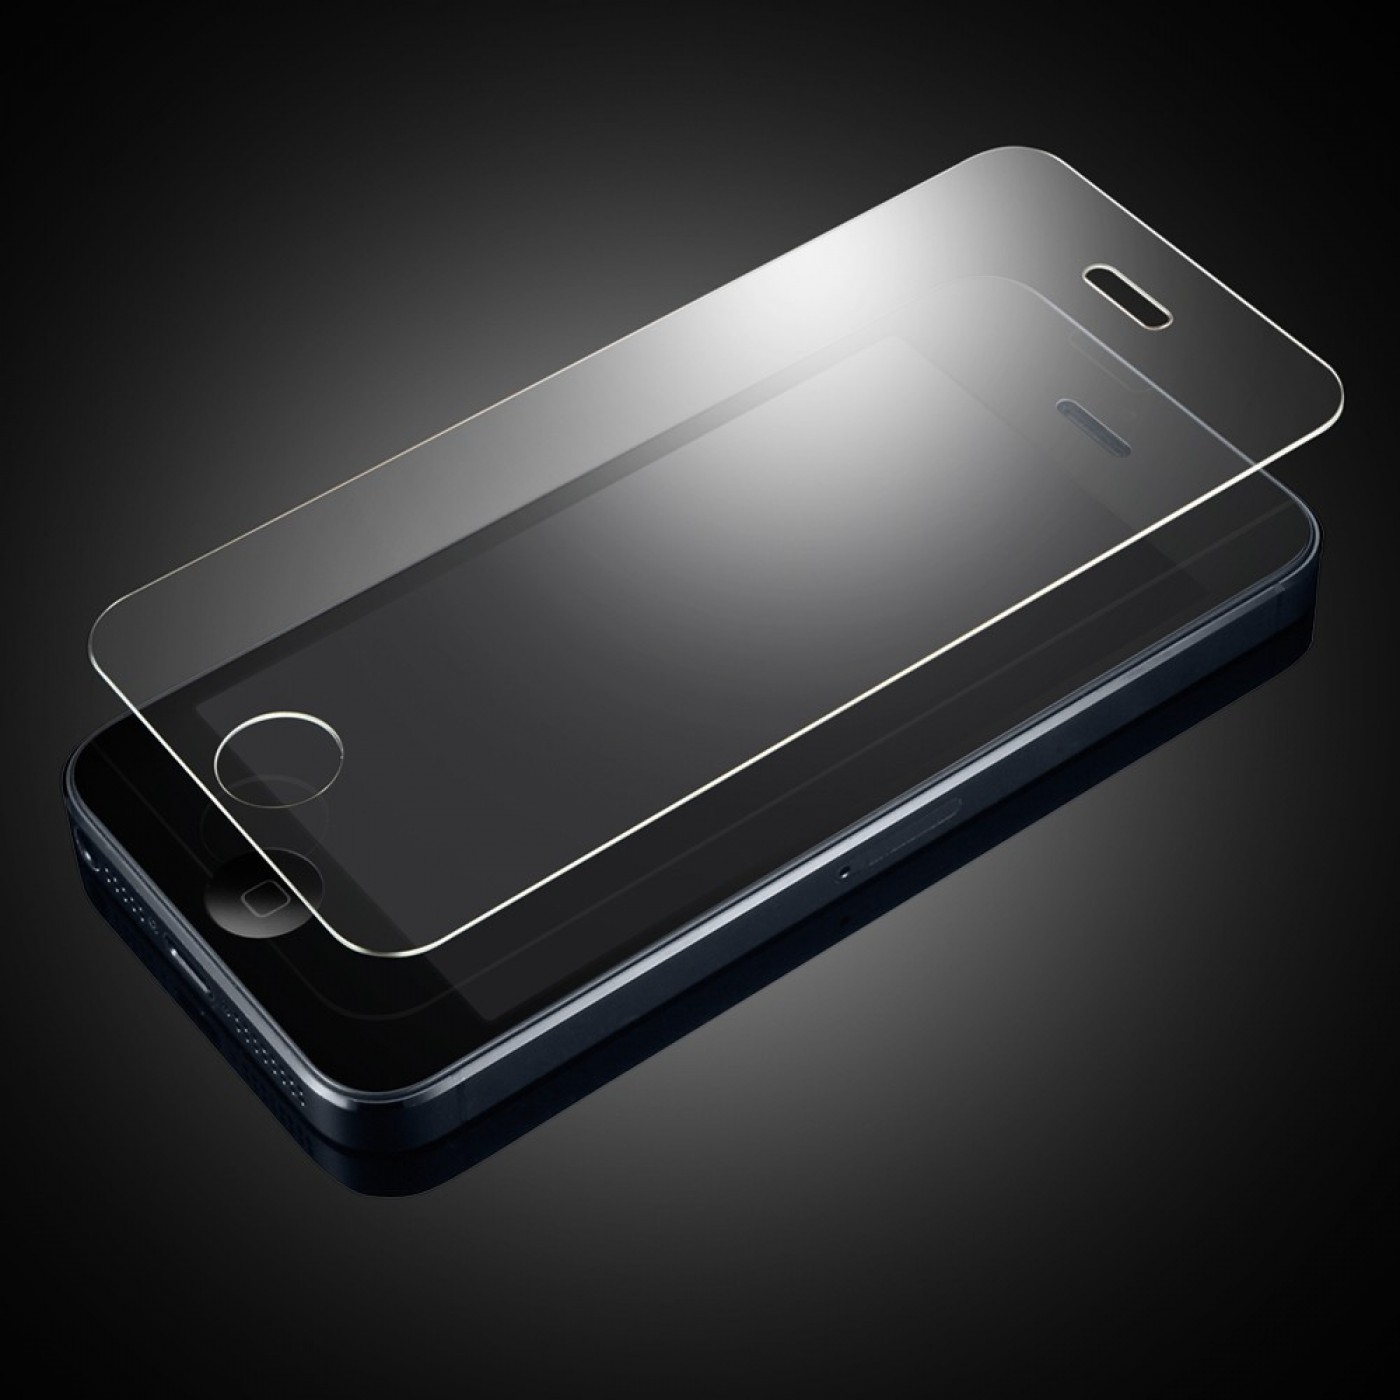 tempered glass vitre de protection iphone 5 5s. Black Bedroom Furniture Sets. Home Design Ideas